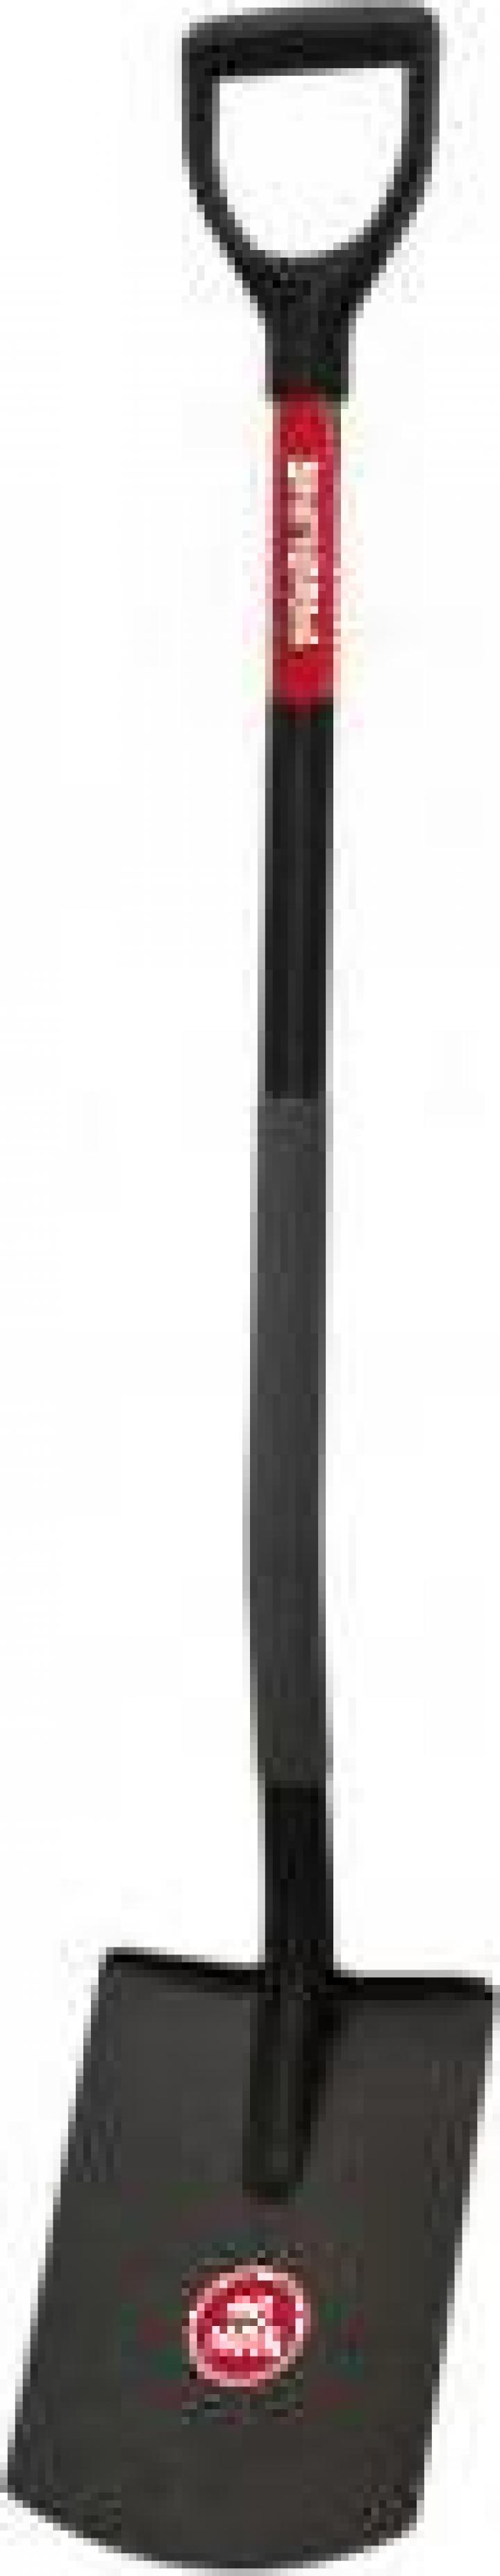 Cazma cu maner metal 190x290/1150mm